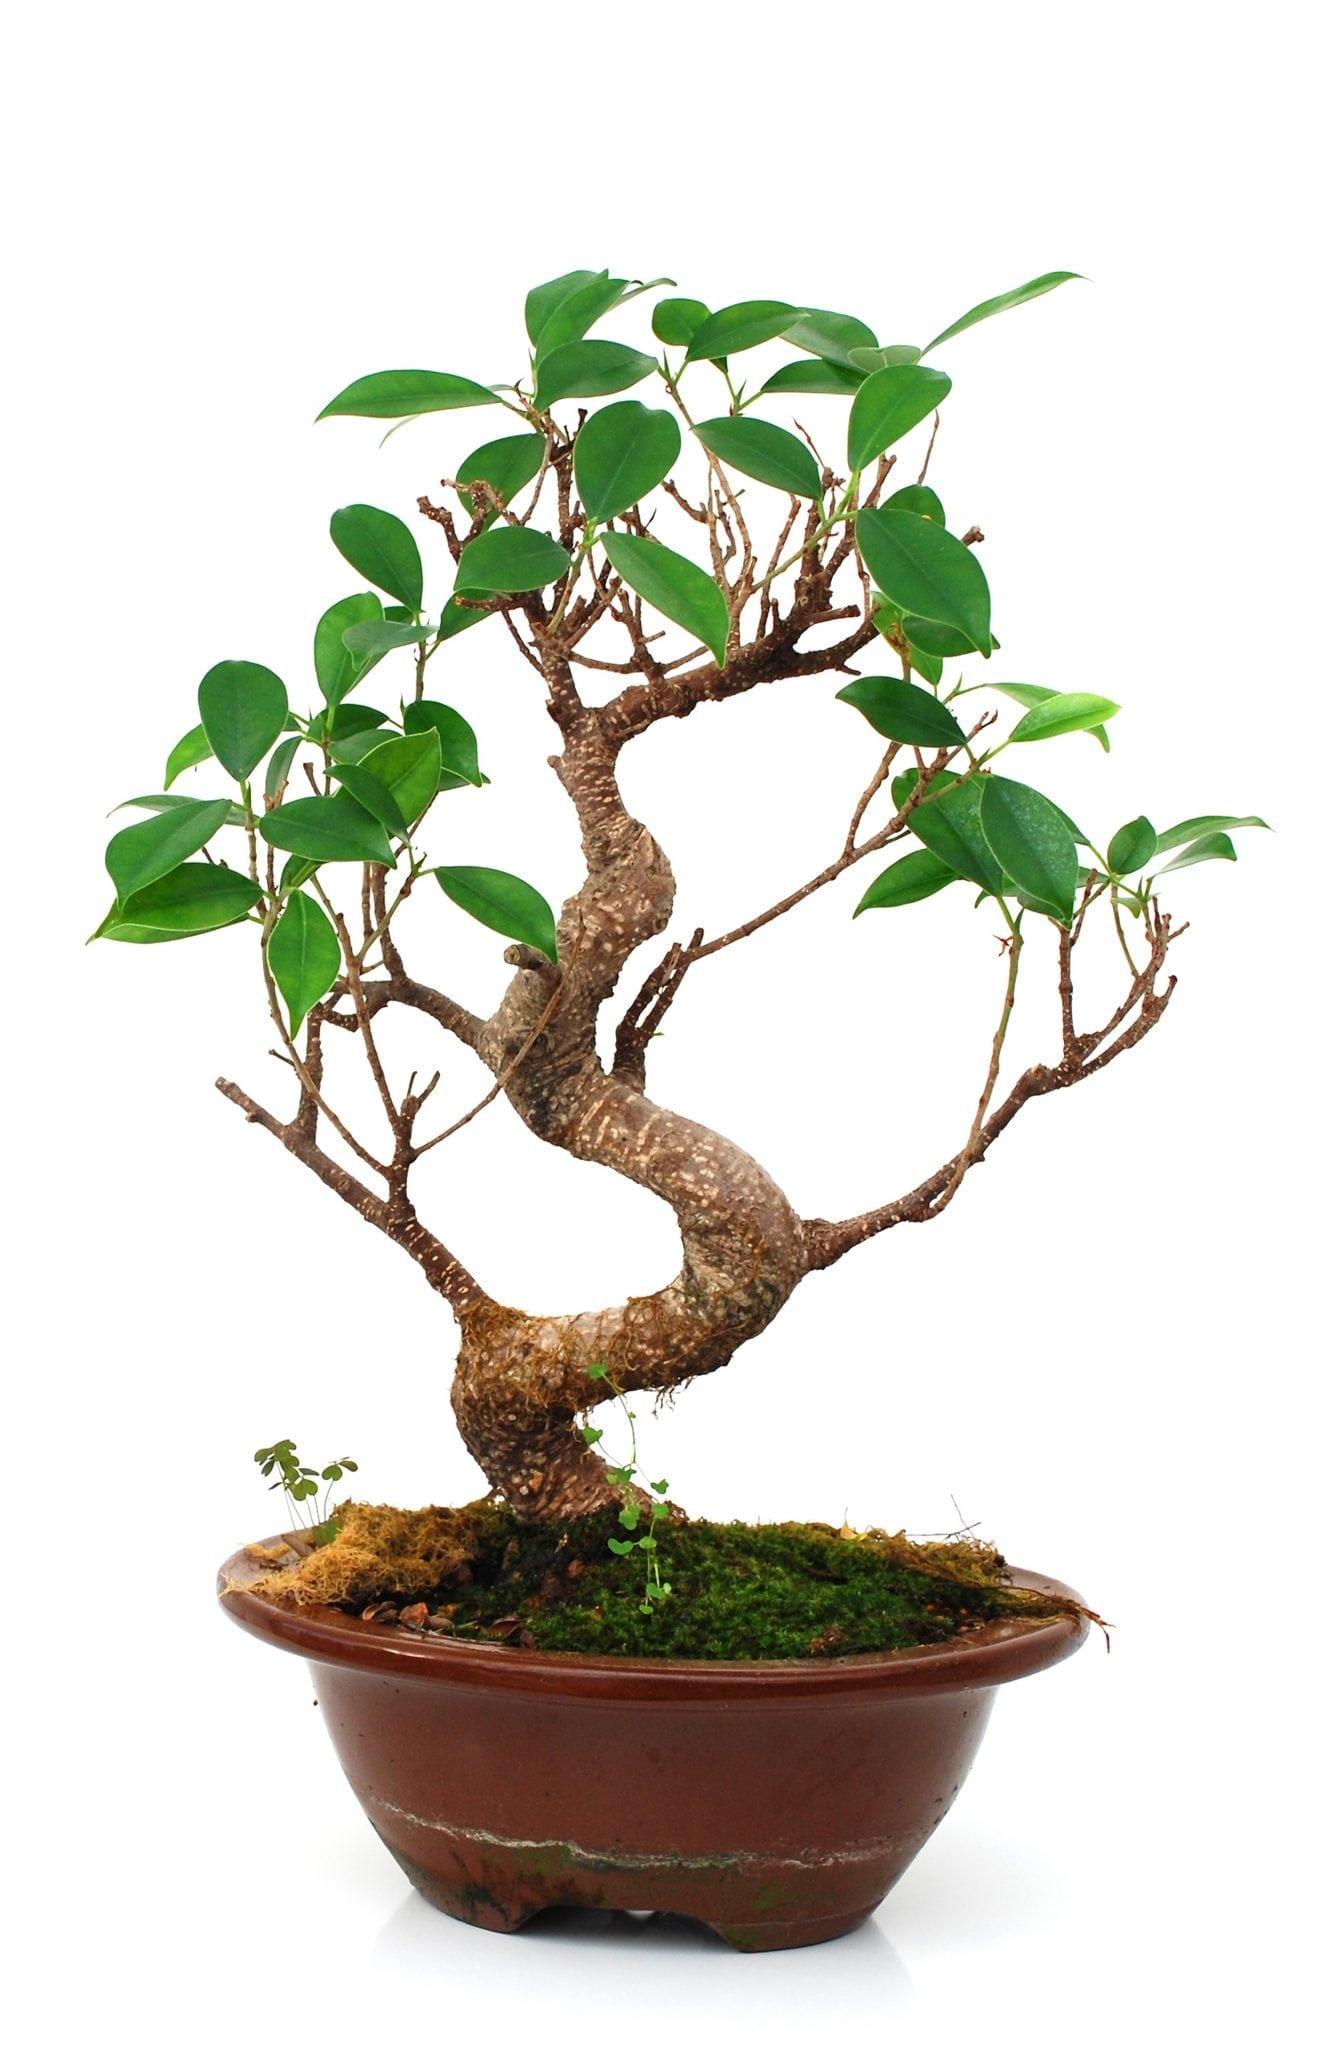 How To Grow Bonsai Trees From Cuttings Bonsai Tree Gardener